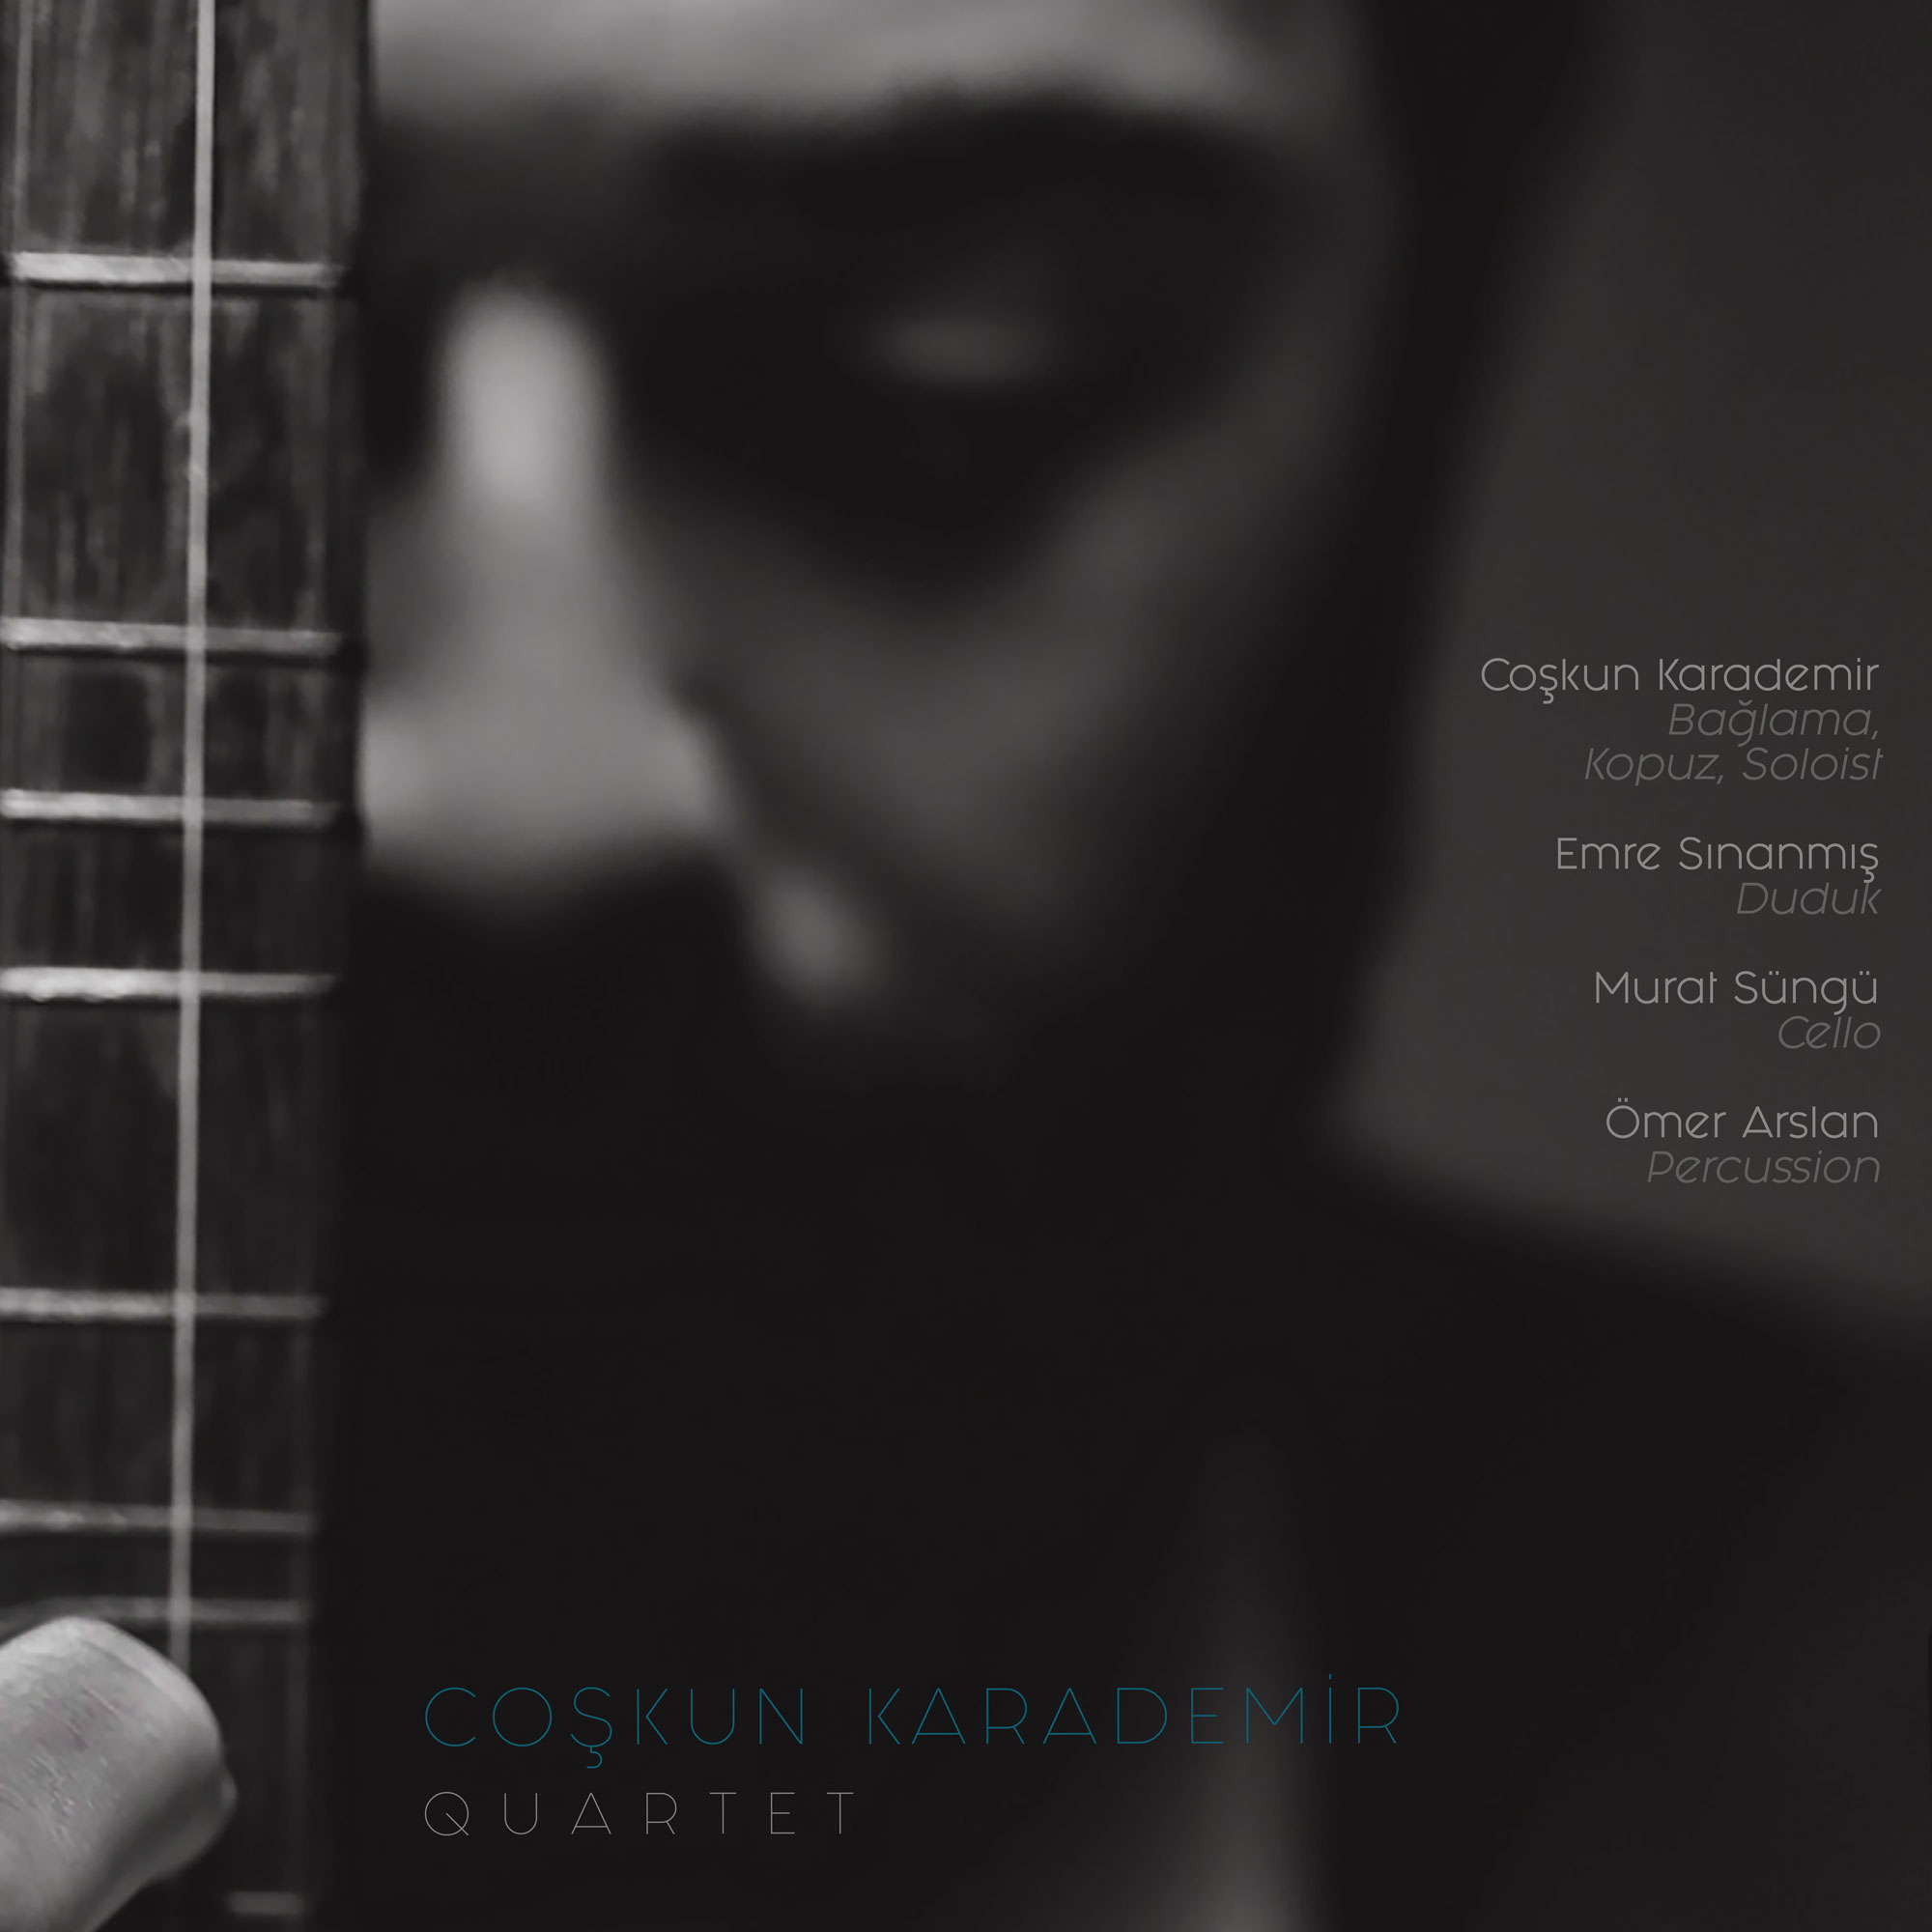 Coşkun Karademir Quartet